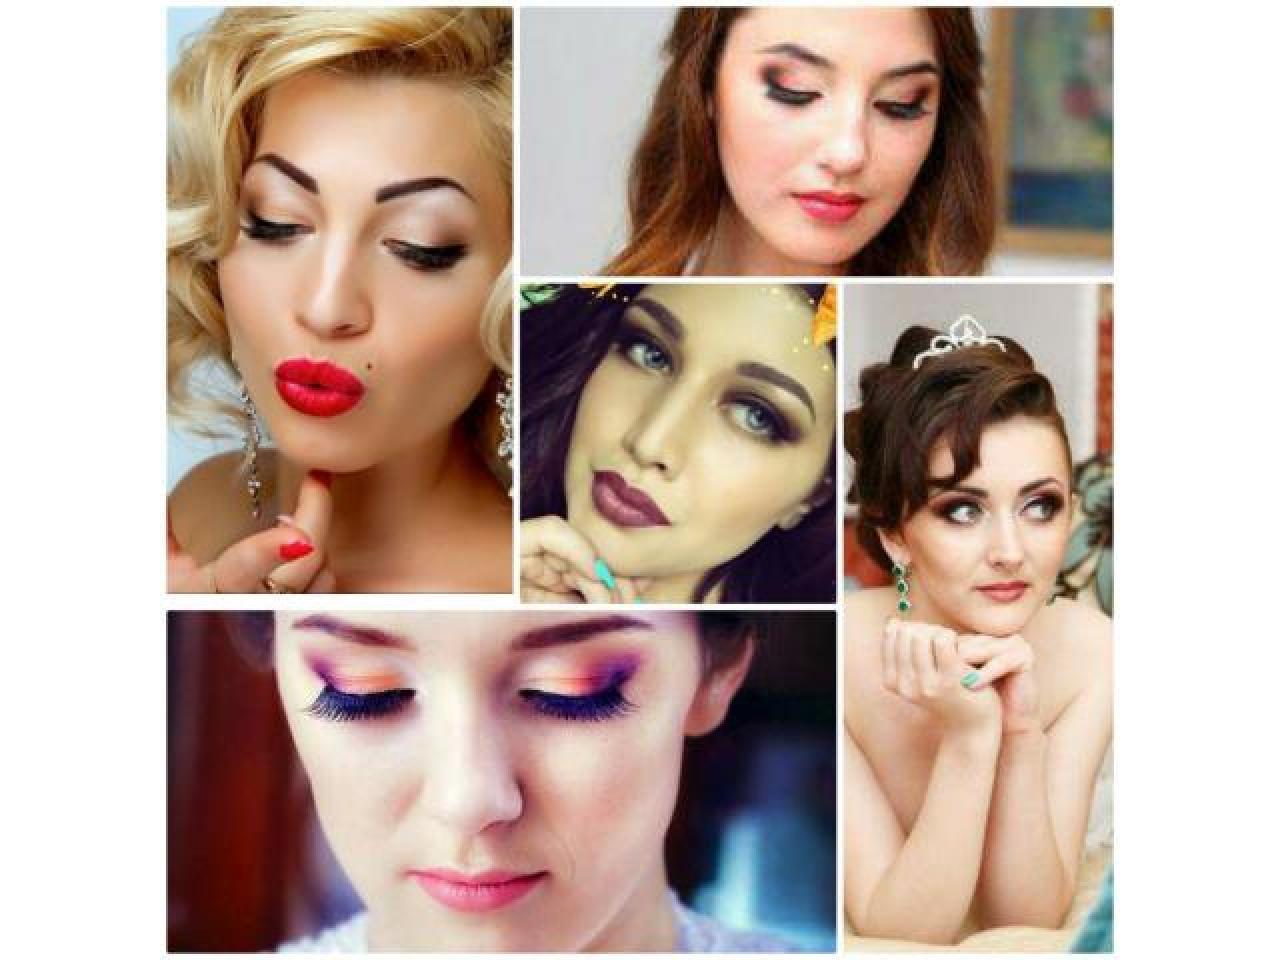 макияж, прически, наращивание ресниц. Makeup, Hairstyle, Eyelash extensions - 4